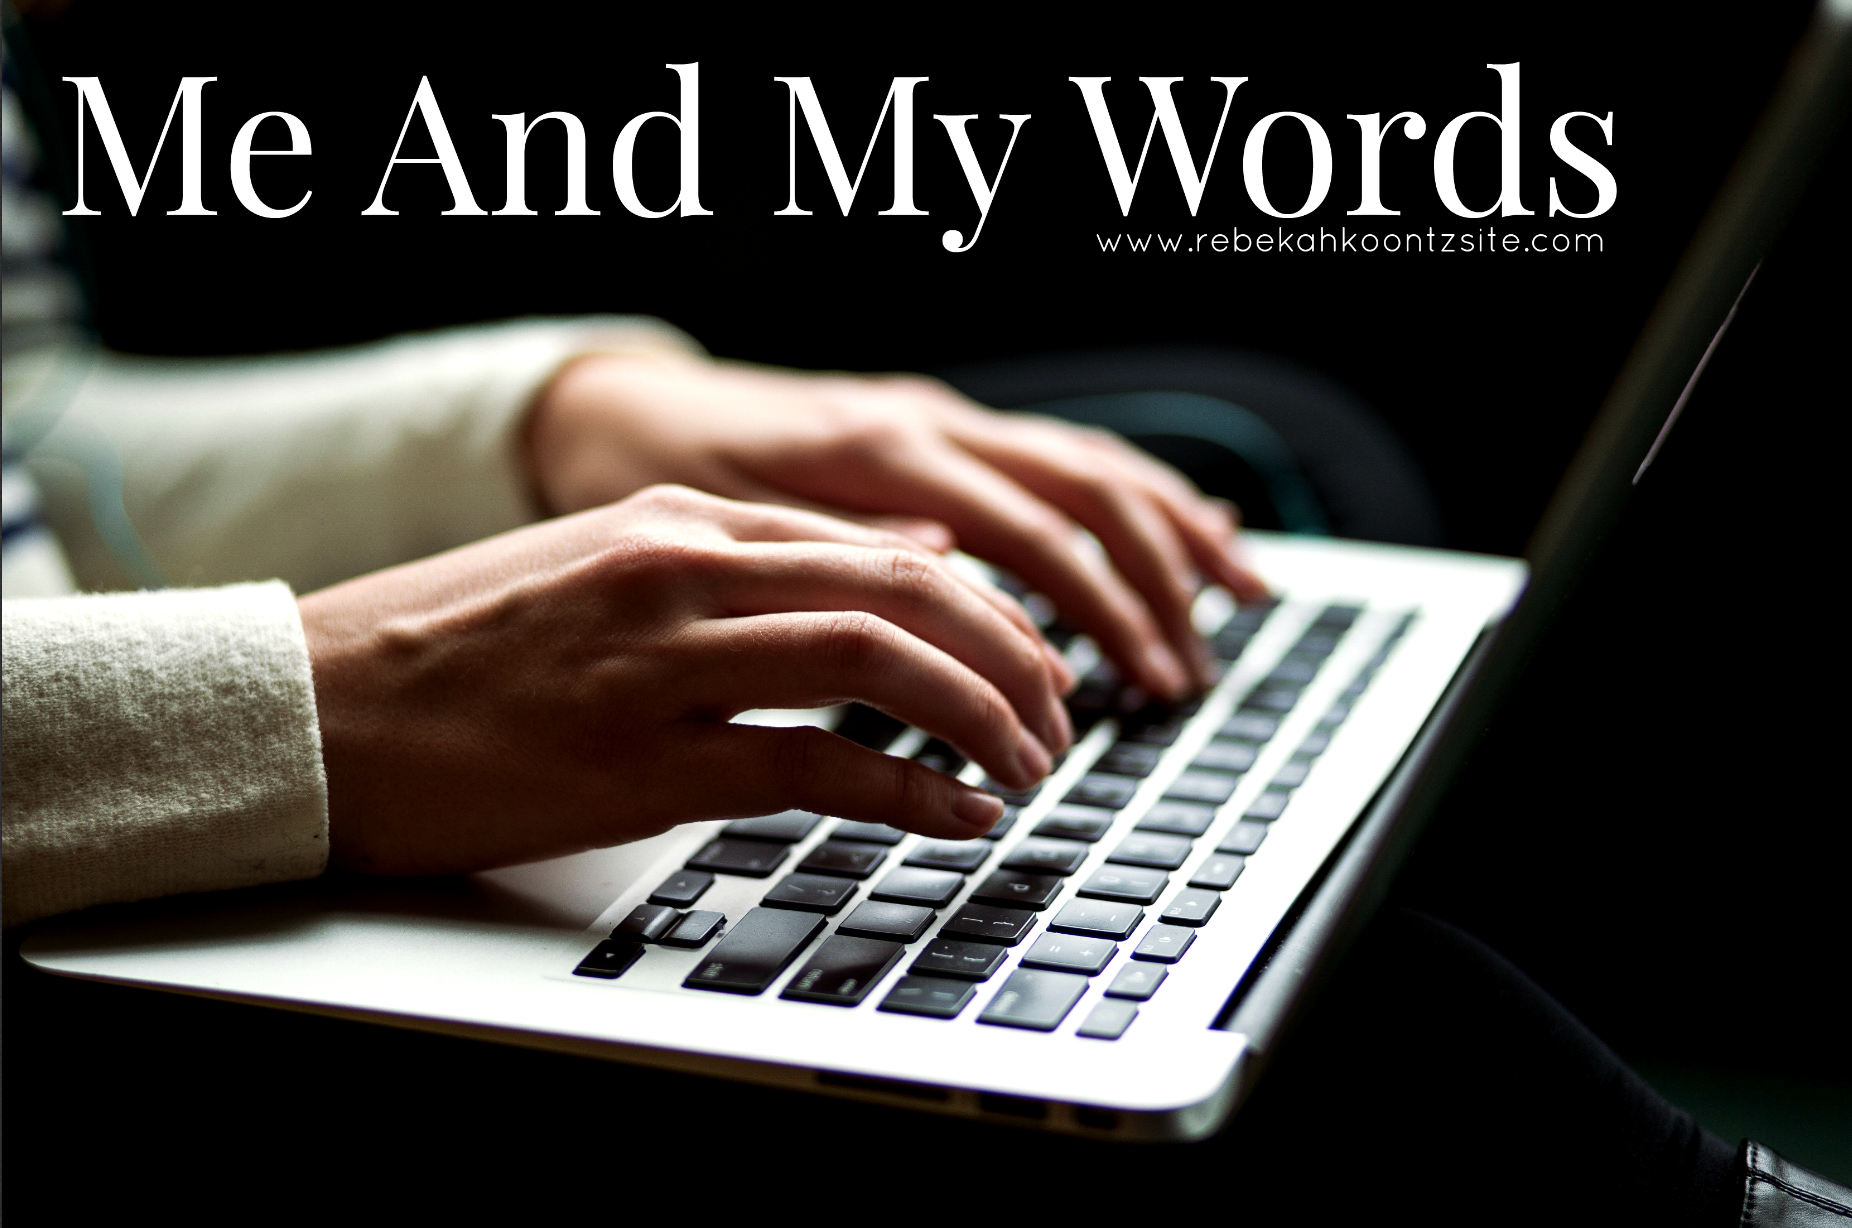 Me and my words Rebekah Koontz Rebecca Coonts blogger